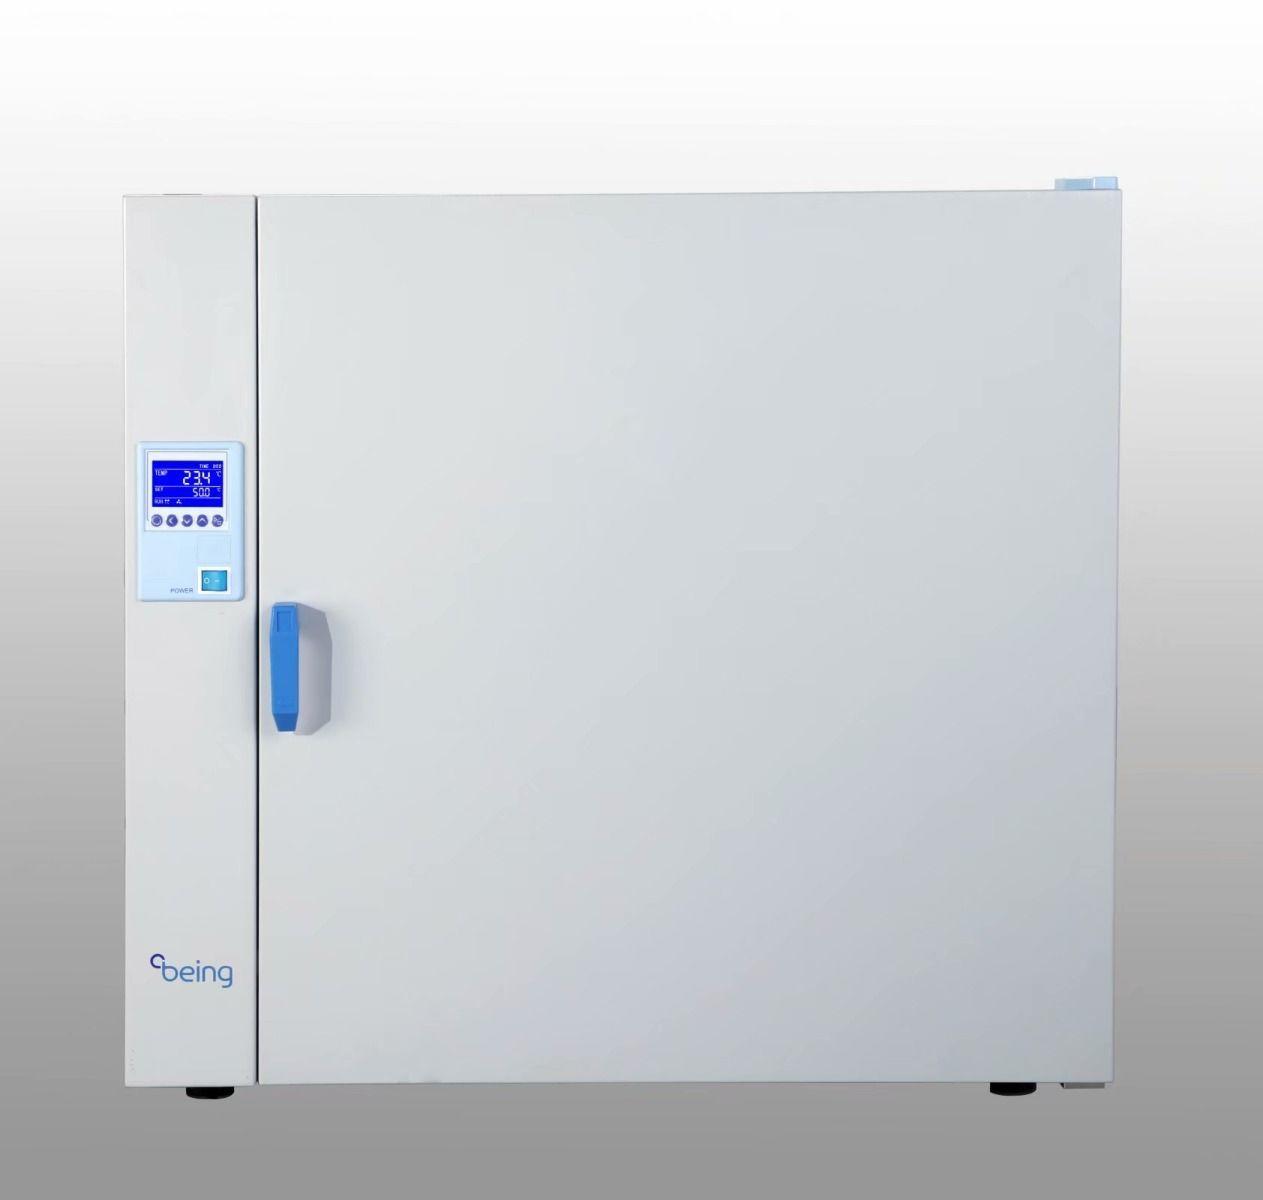 BIF-200 BEING with Fan Incubator, amb.+5-80℃, 230 liters